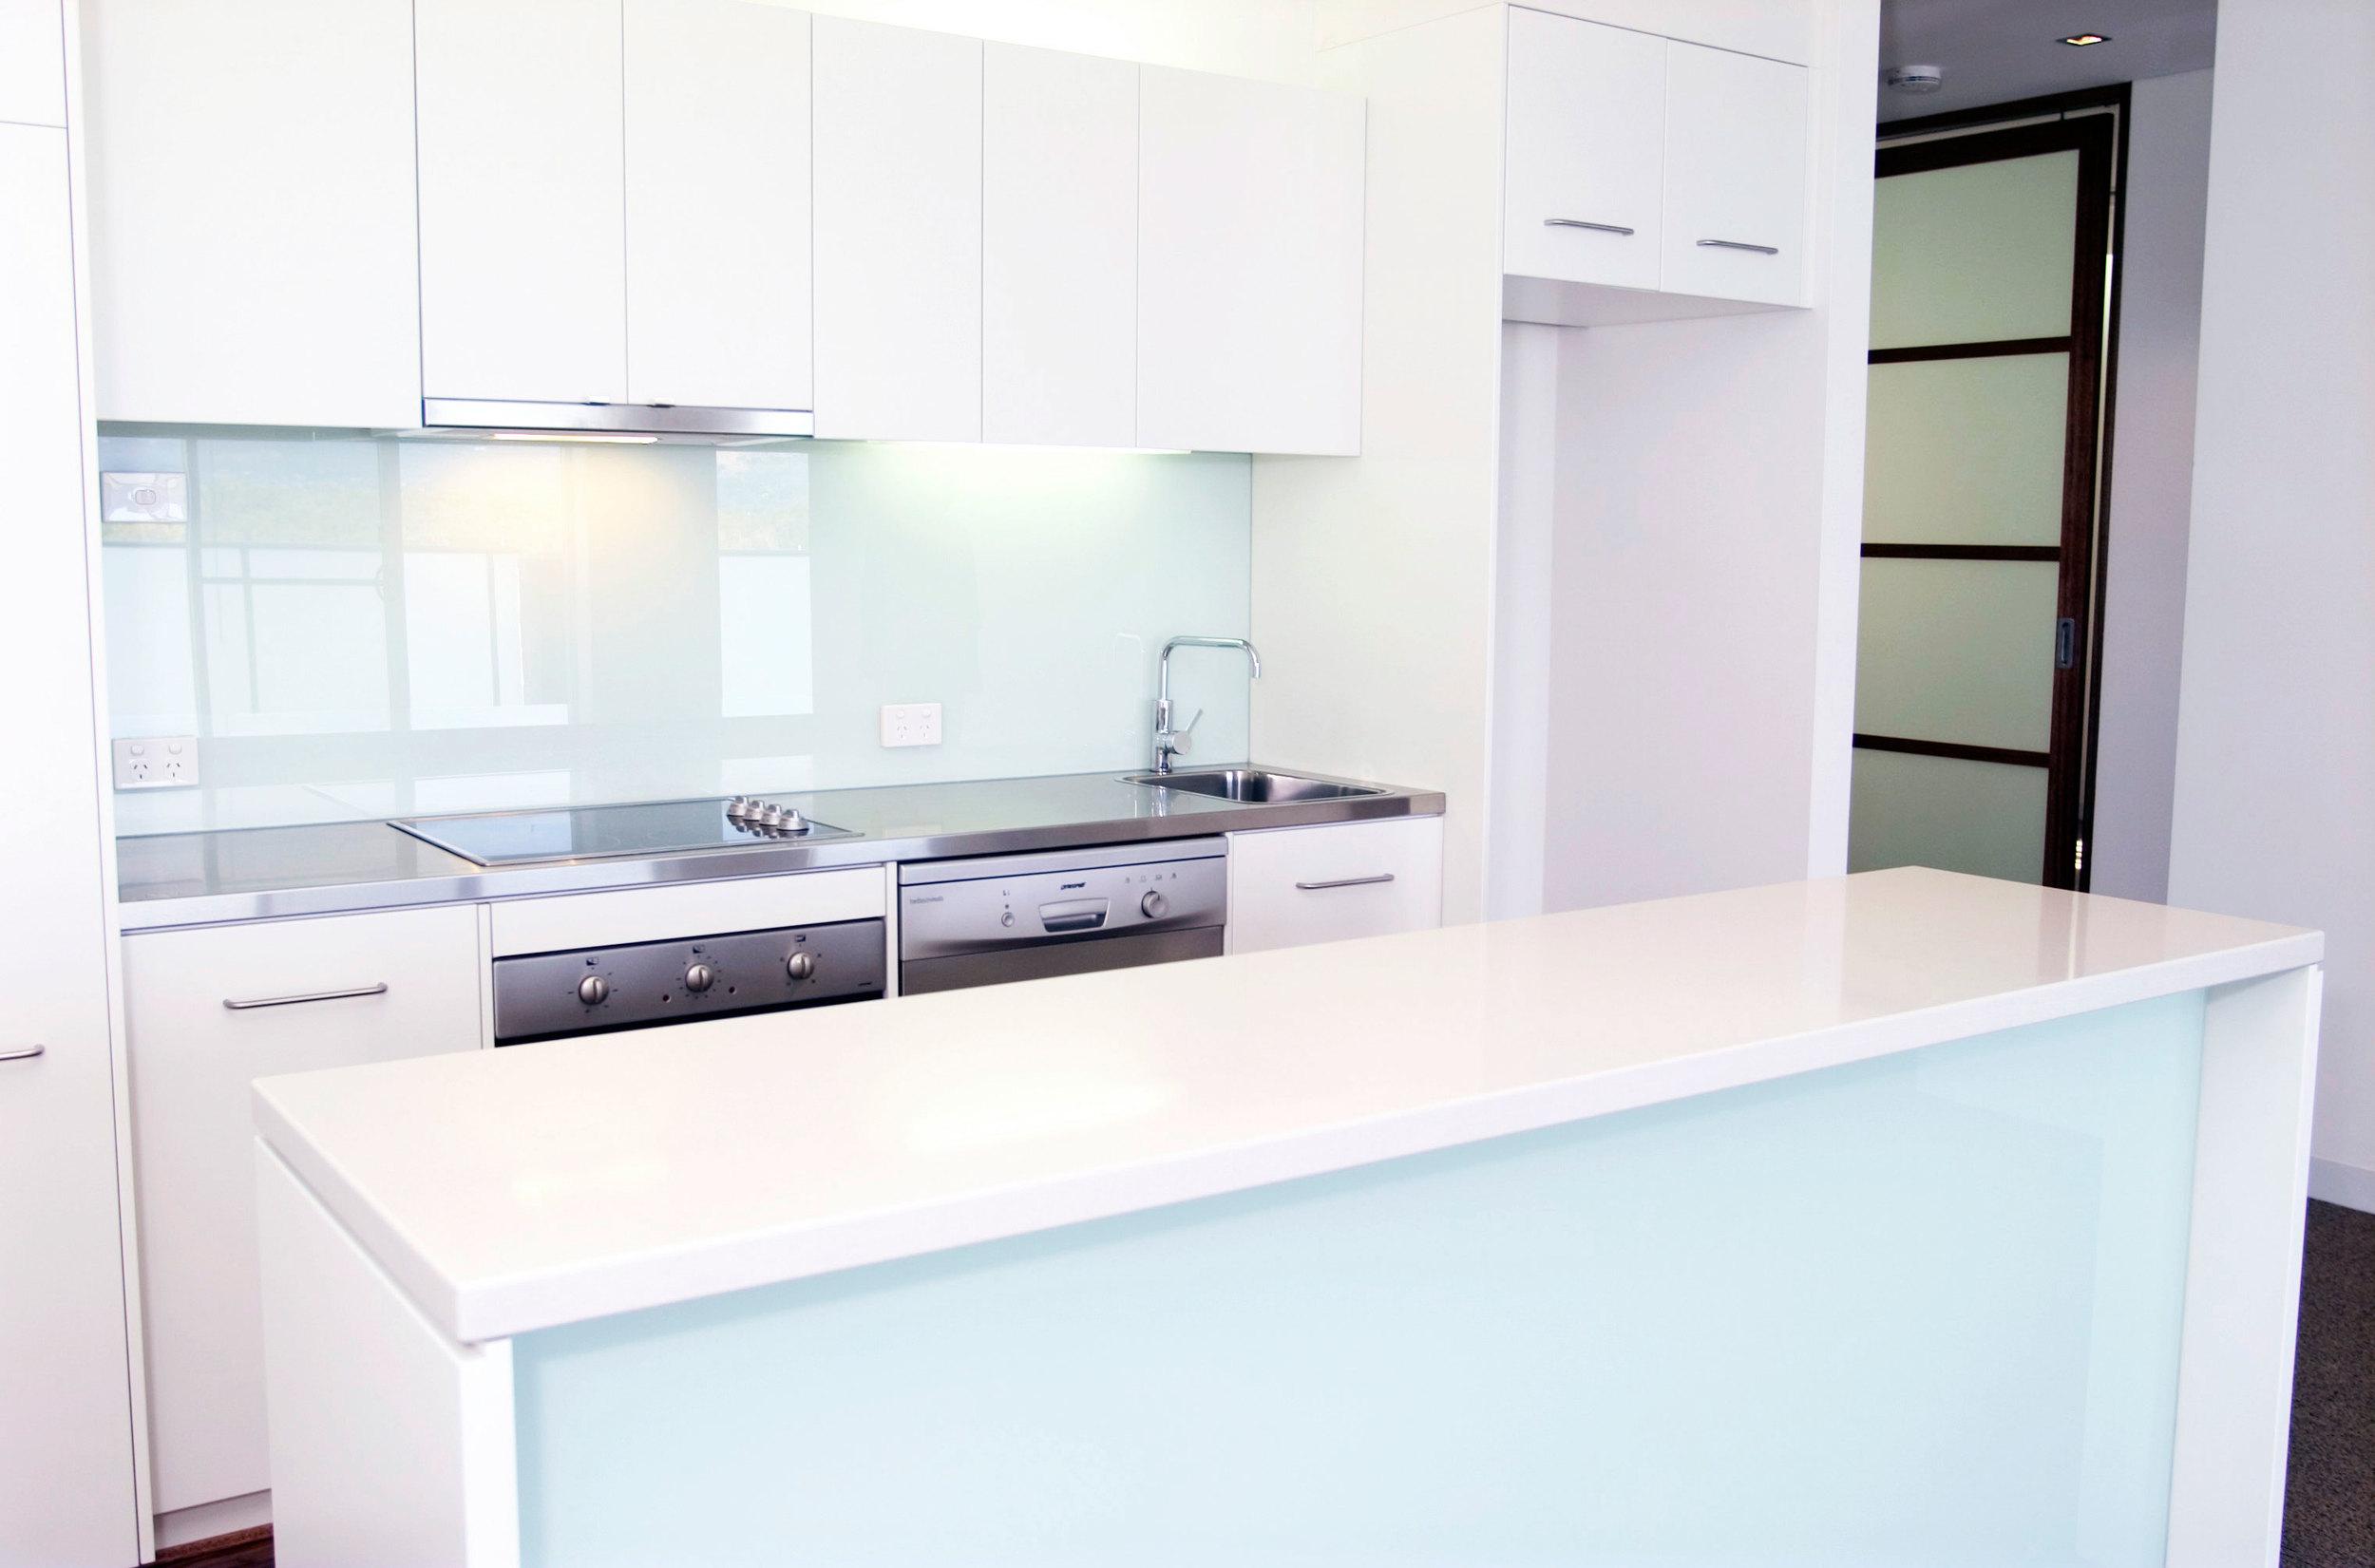 Apartment configurations vary for maximum marketability